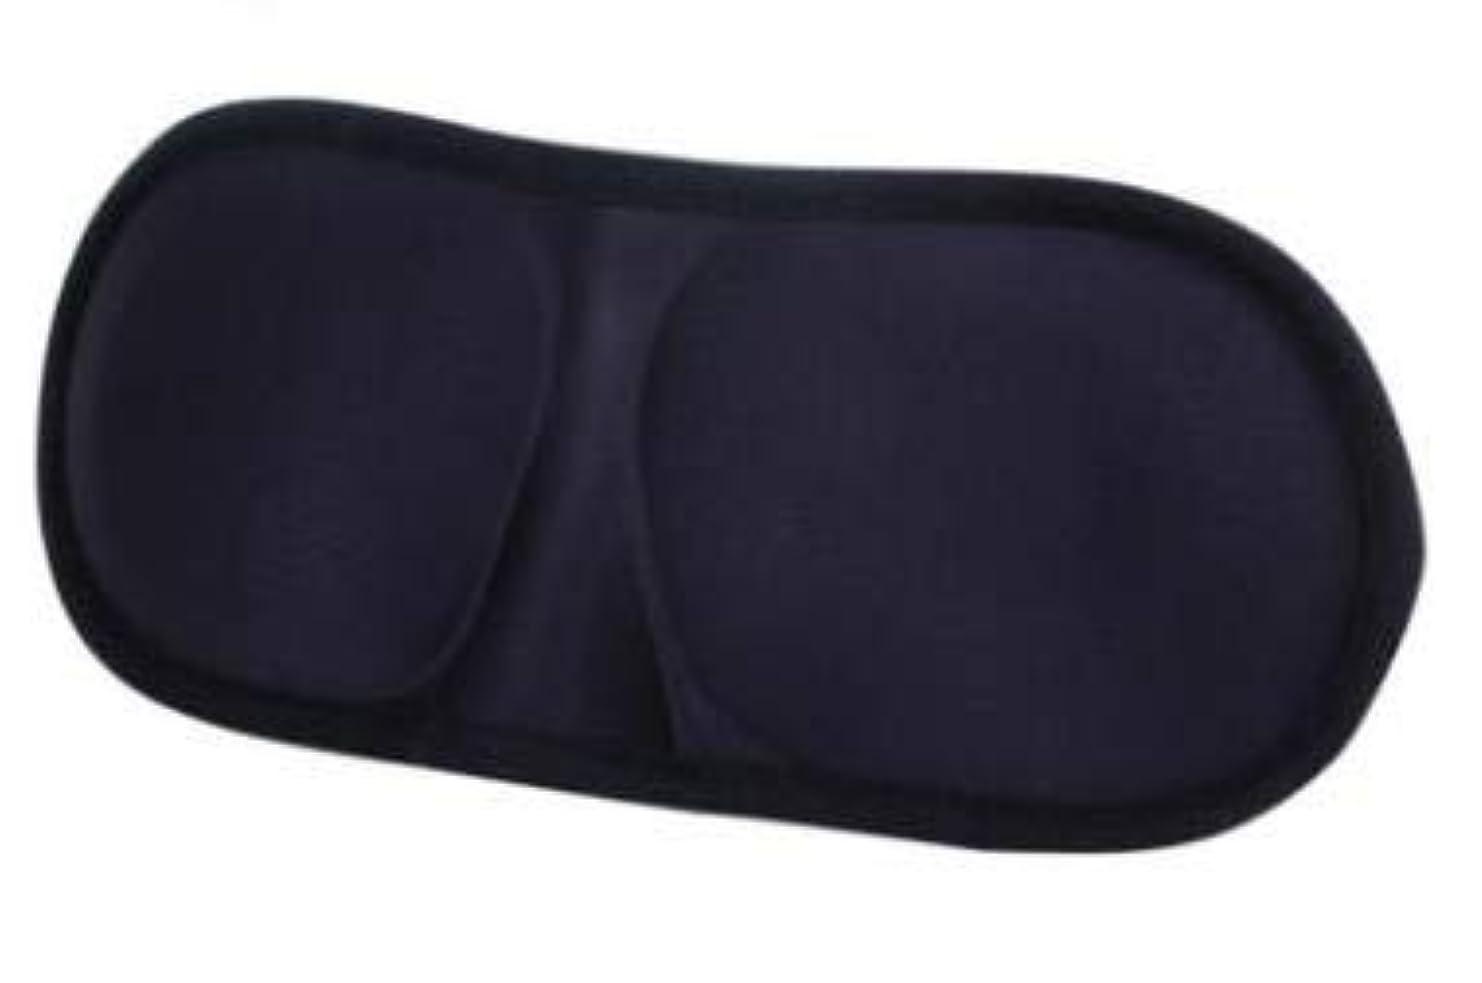 NOTE 3D睡眠マスク超ソフト通気性生地アイシェード睡眠アイマスク旅行睡眠休息エイドアイマスクカバーアイパッチ